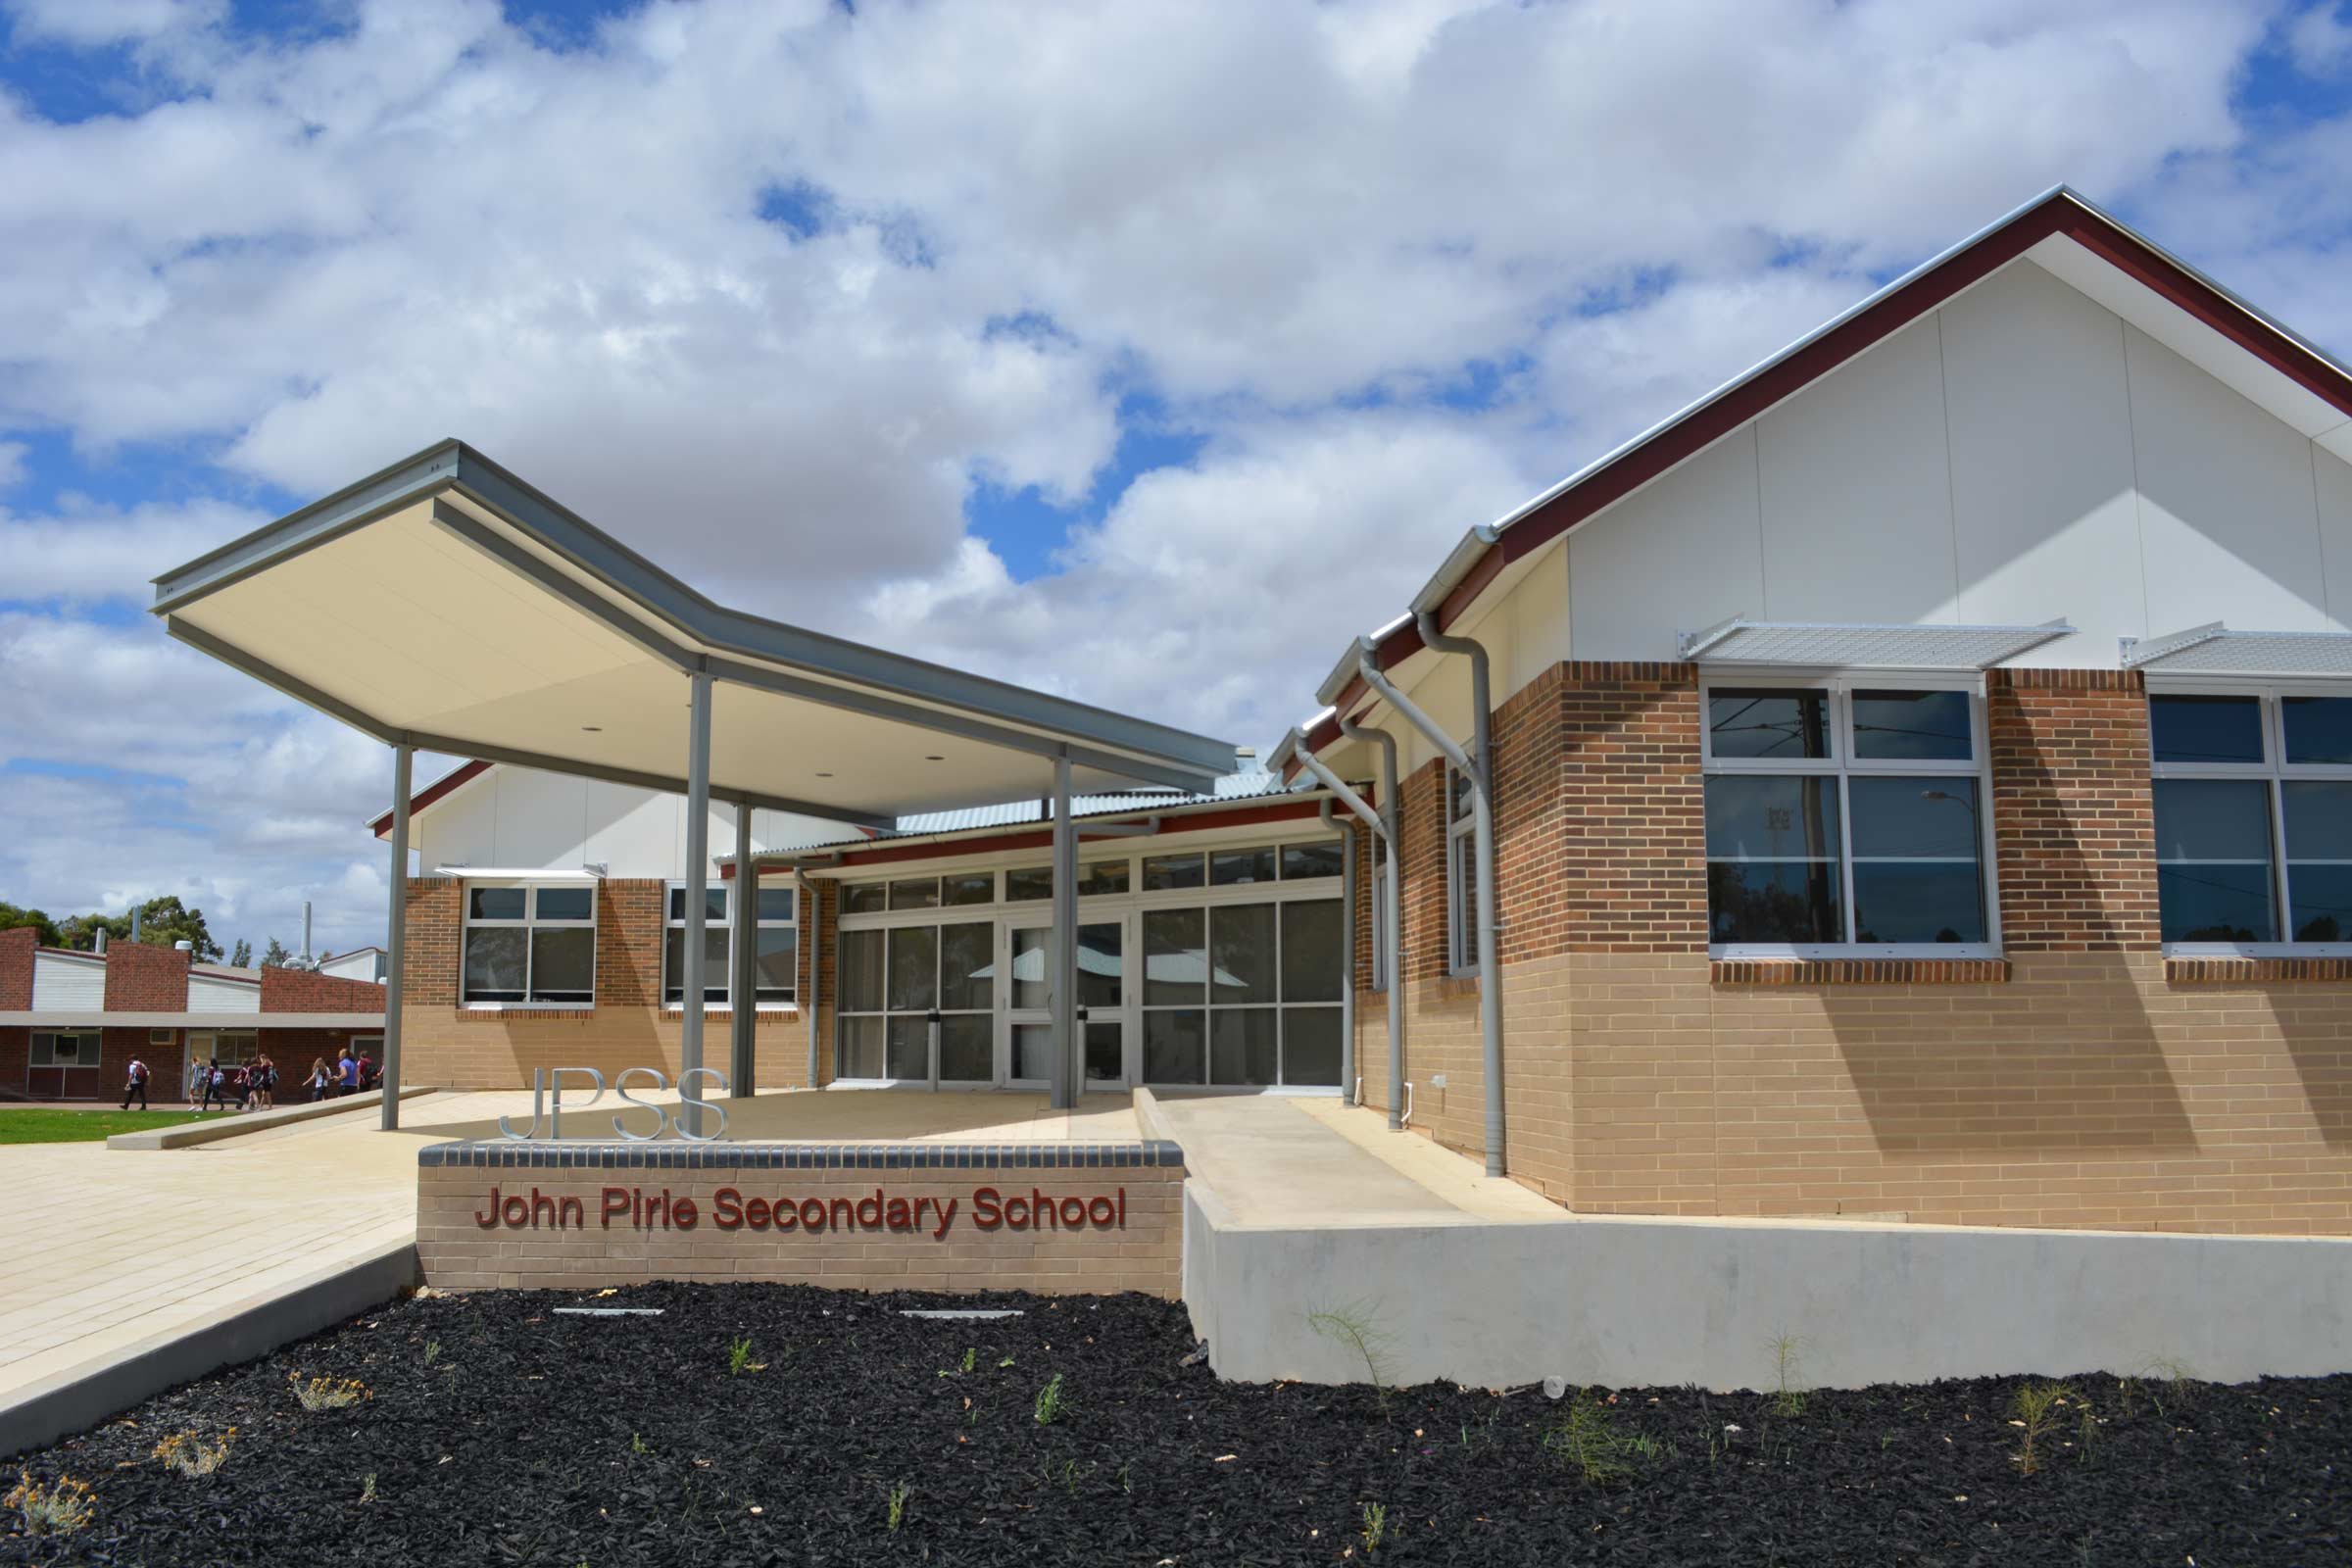 john pirie secondary school administration